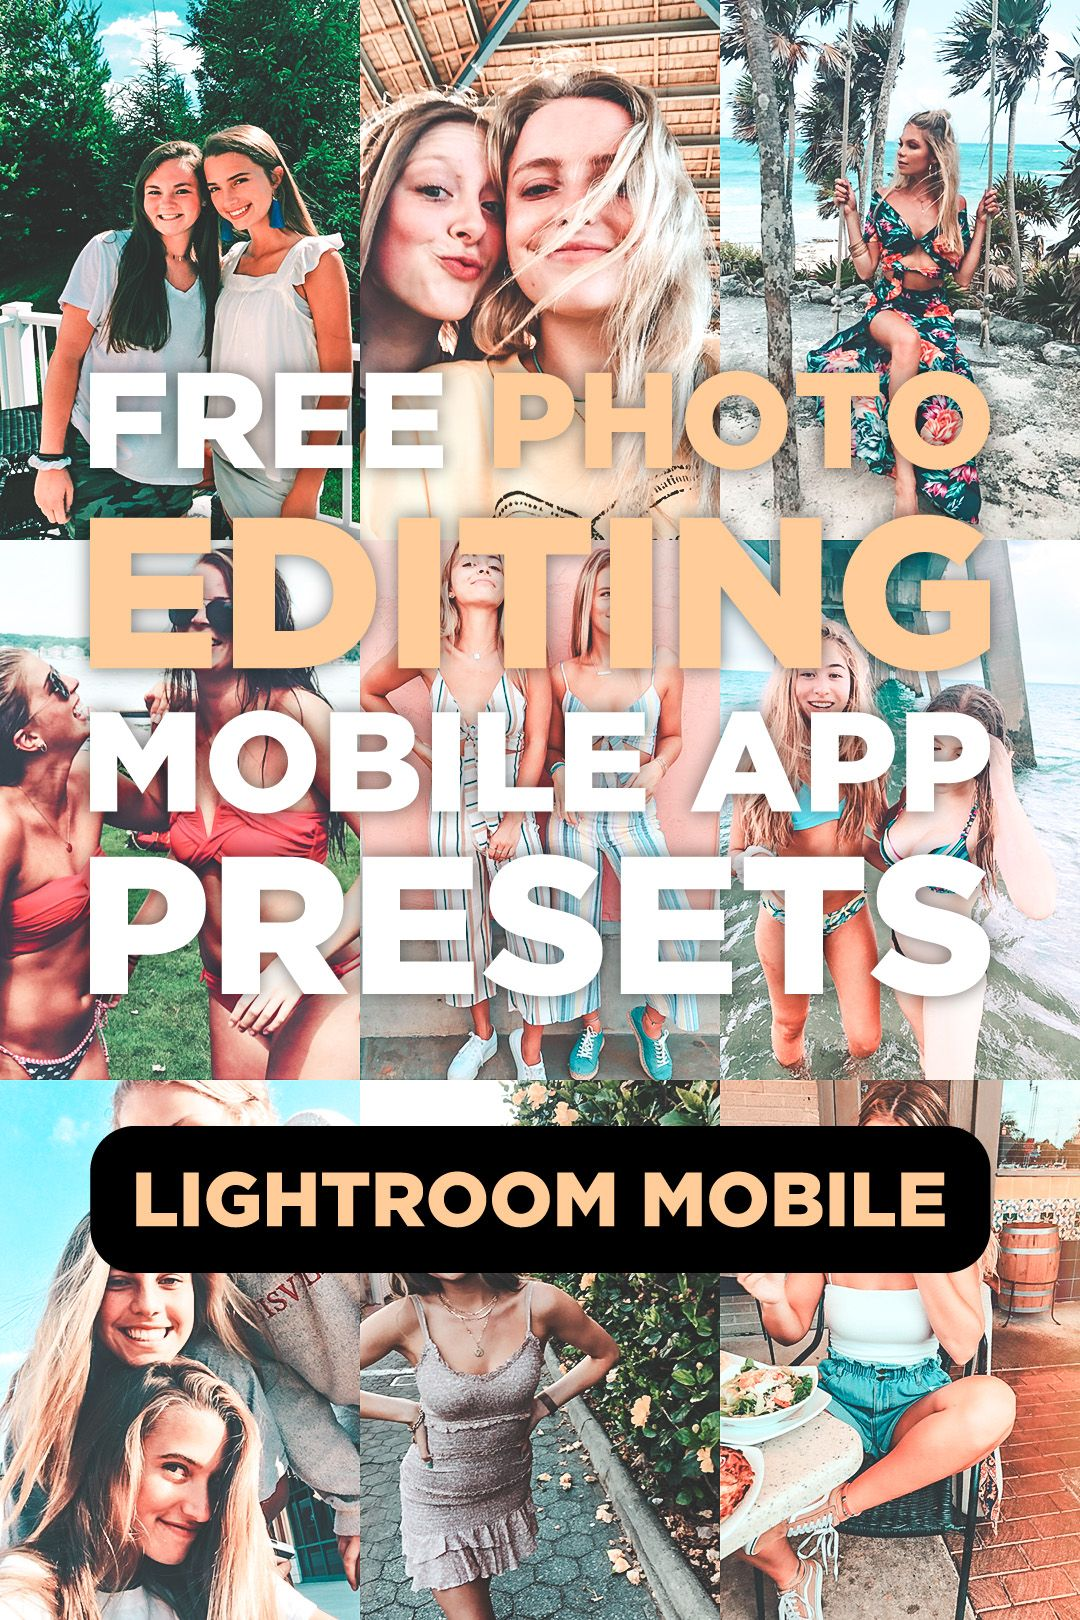 7 mobile lightroom presets bondi photo editing apps